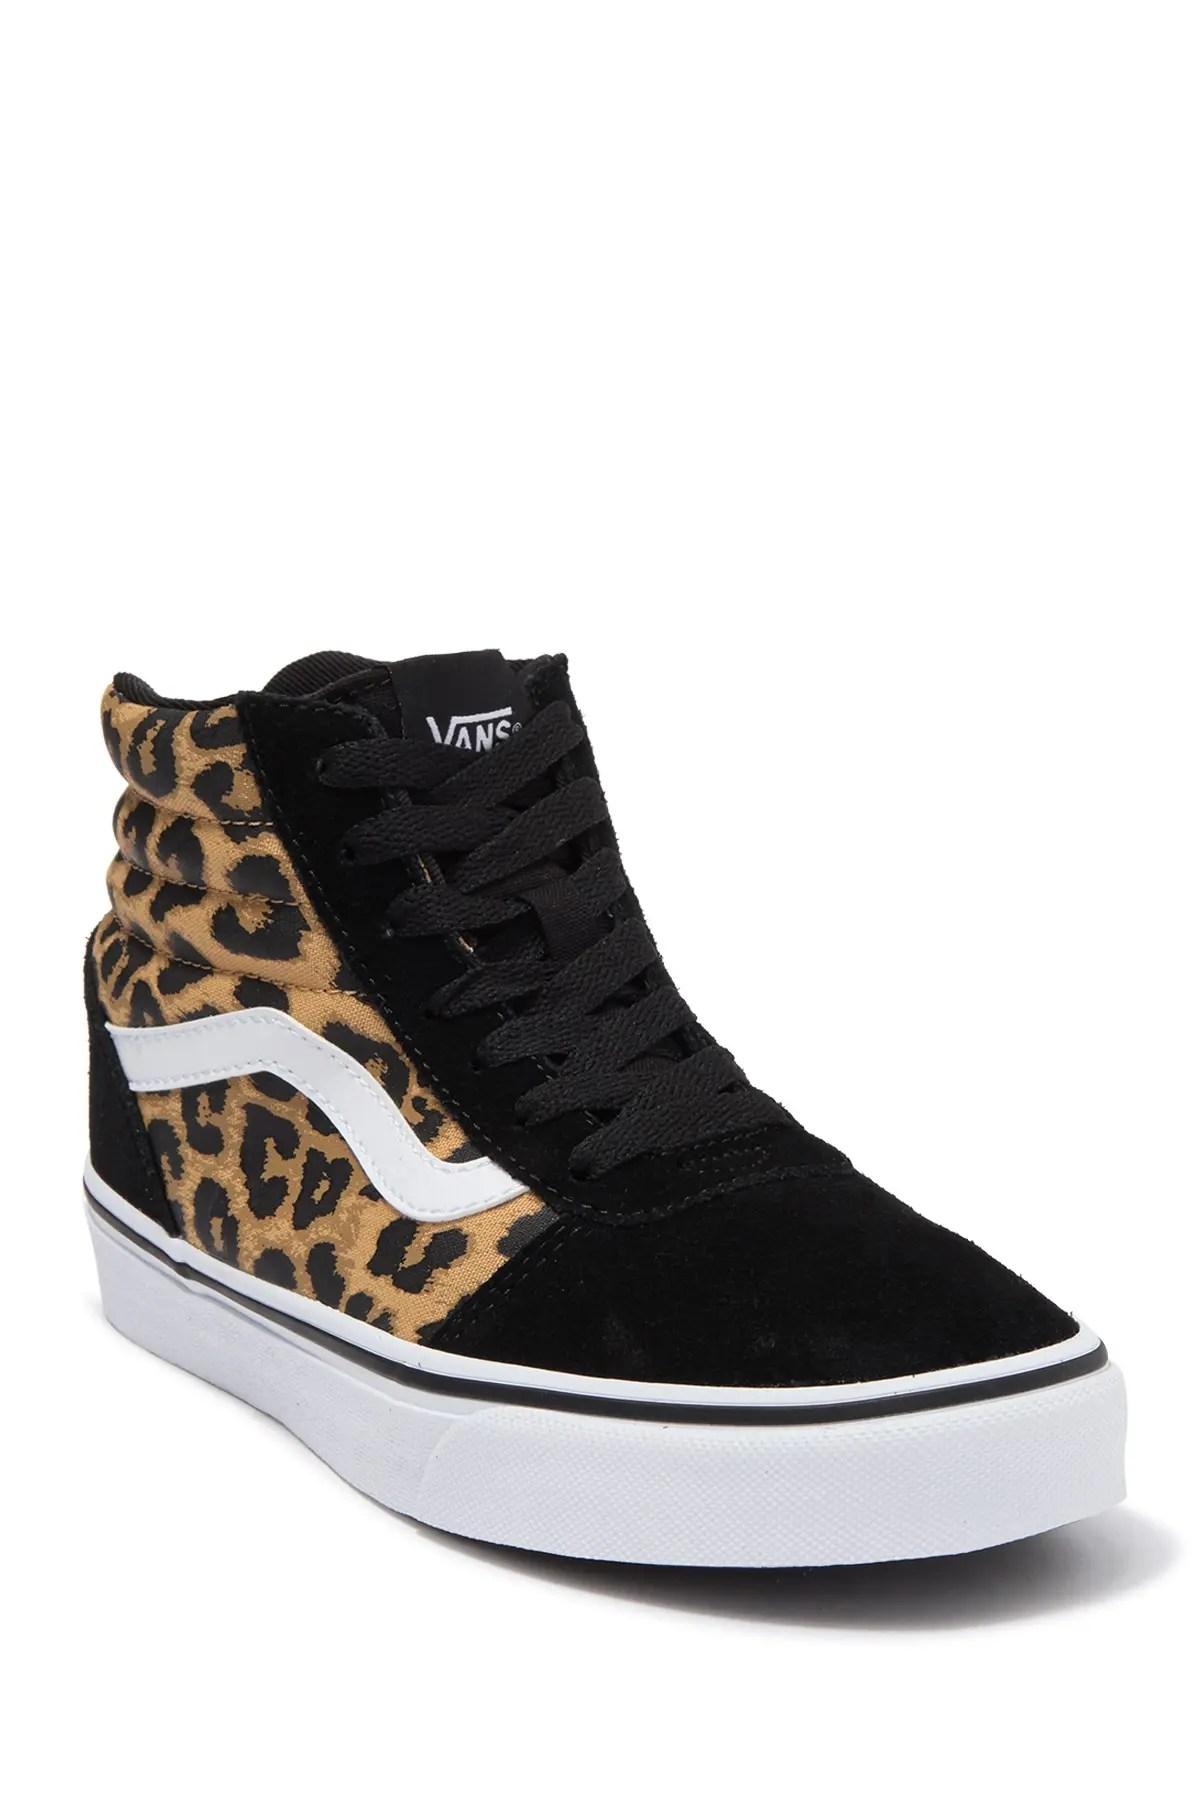 vans ward leopard print high top sneaker nordstrom rack